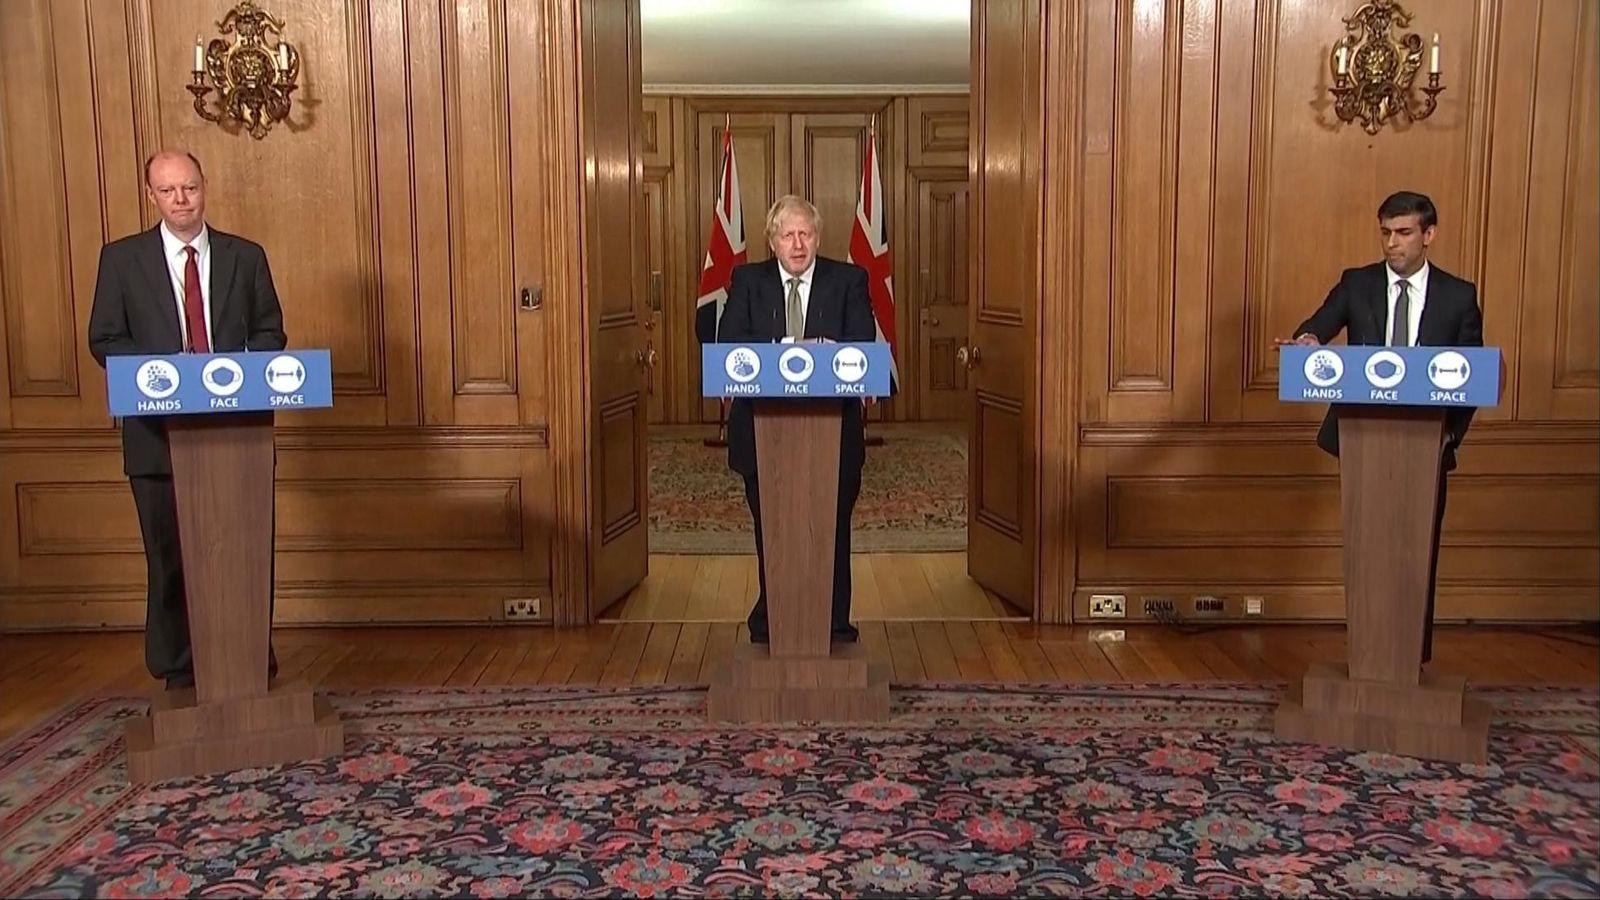 Coronavirus News LIVE – Boris Johnson Briefing Updates: Prime Minister outlines a three-tier insurance system   UK News